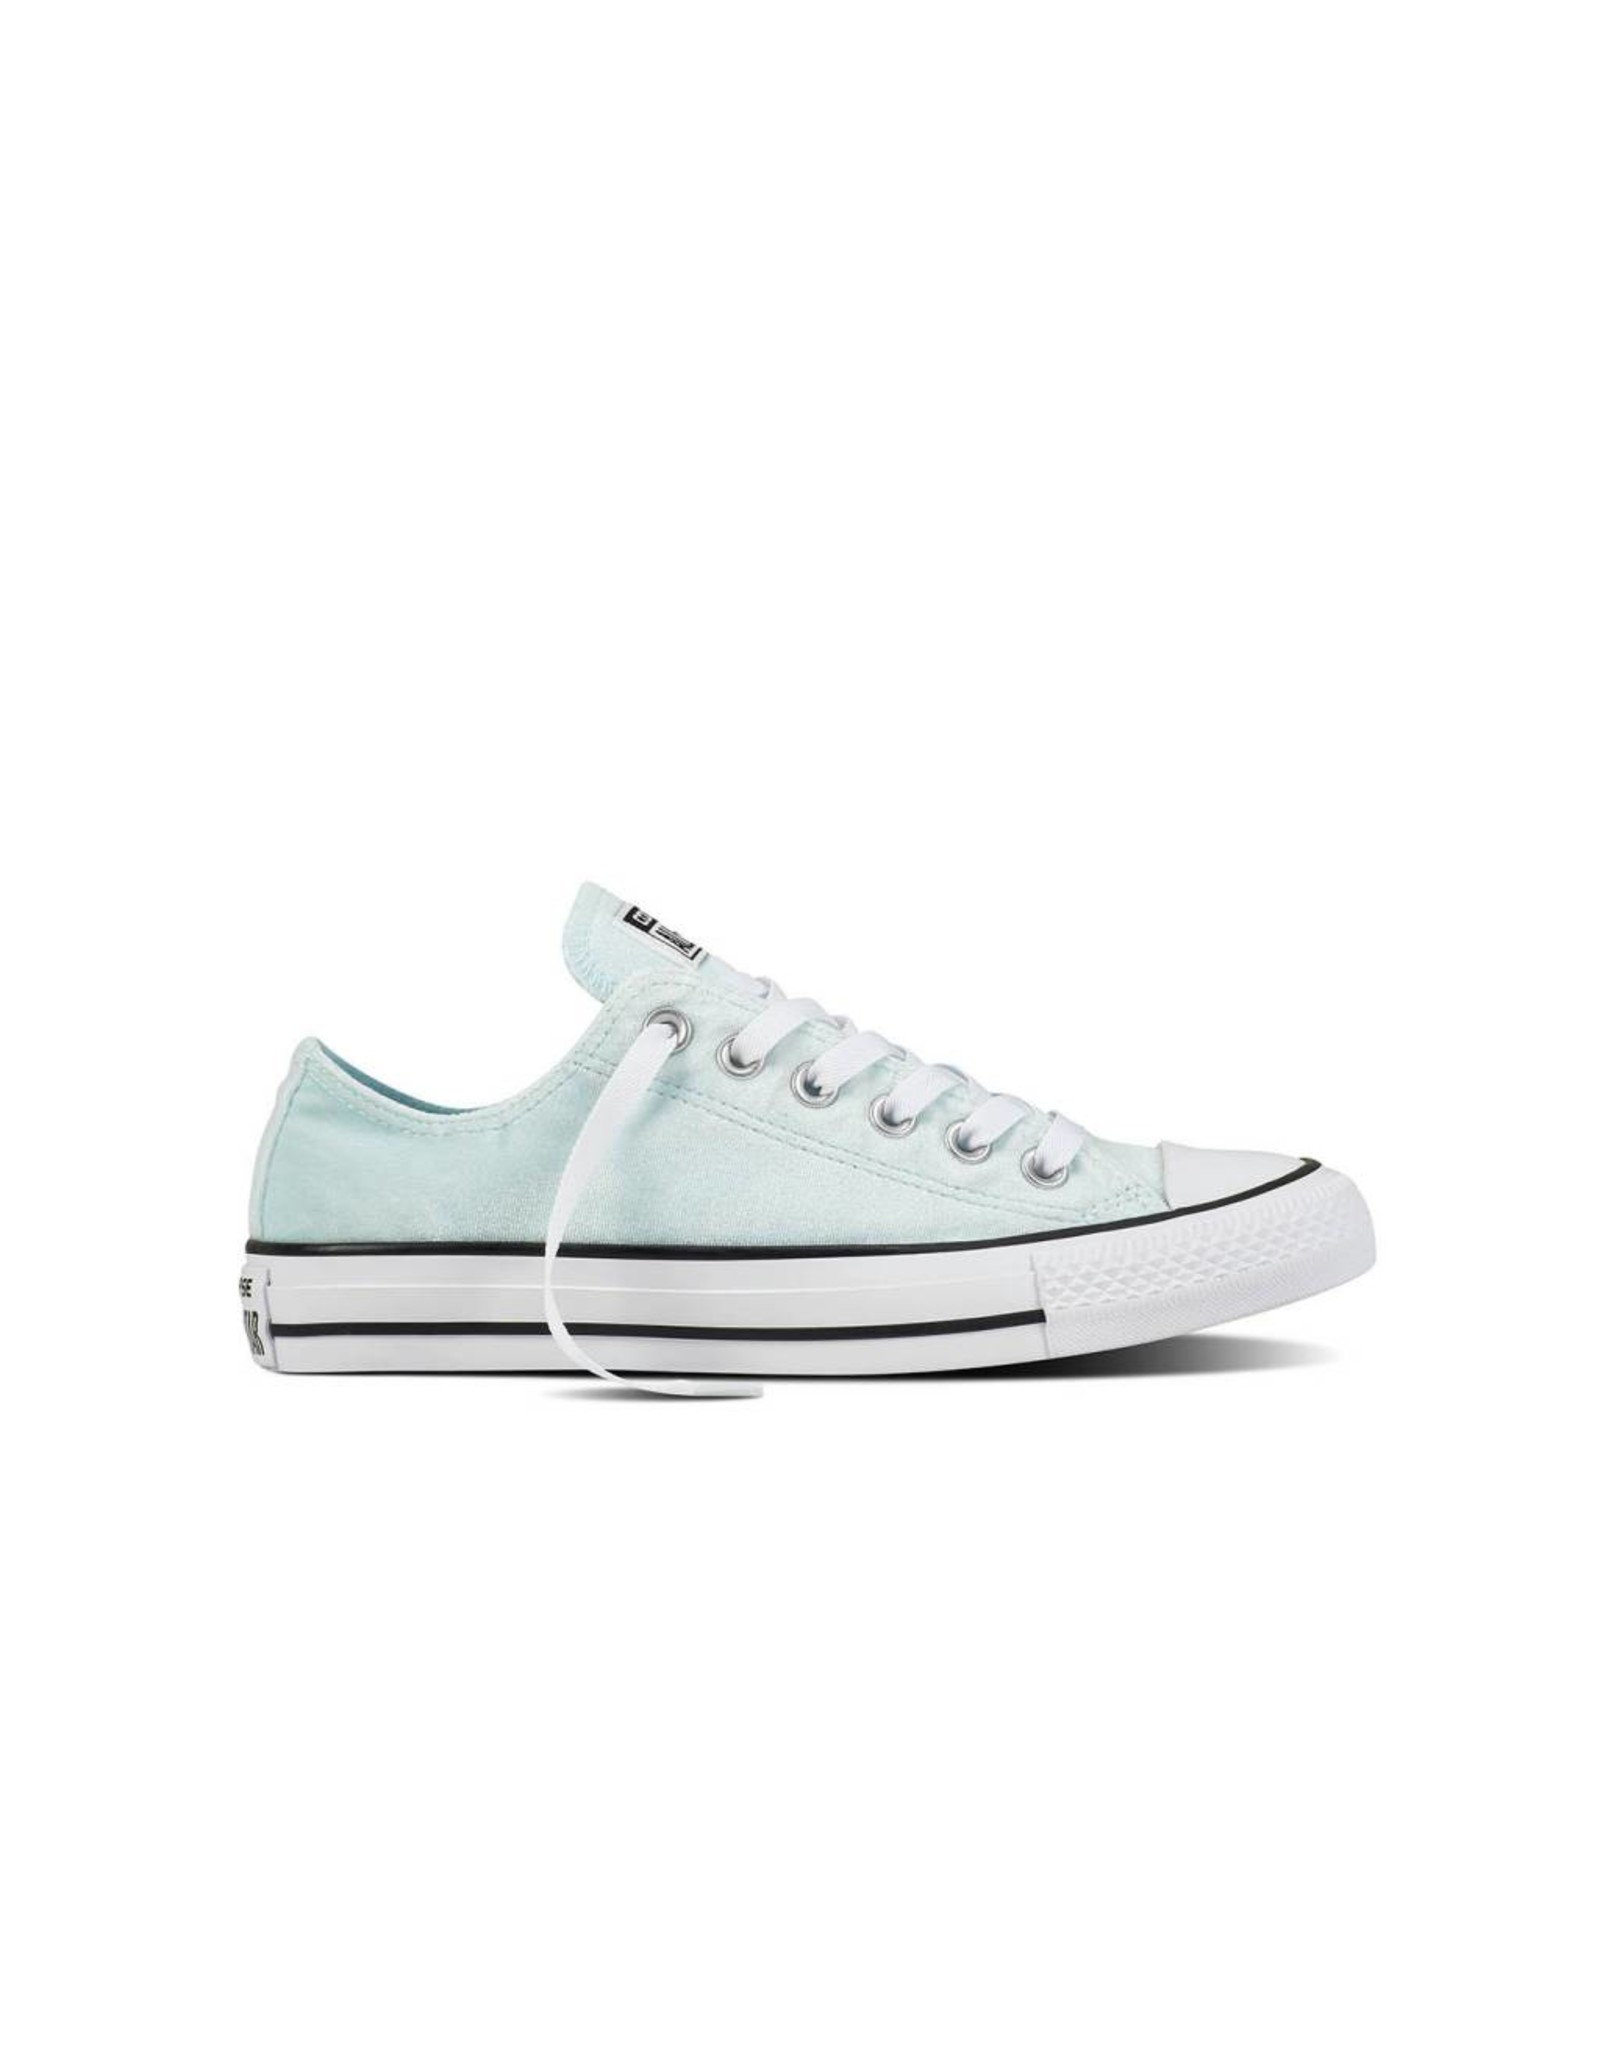 CONVERSE CHUCK TAYLOR OX GLACIER BLUE/WHITE/WHITE C11VBL-557992C